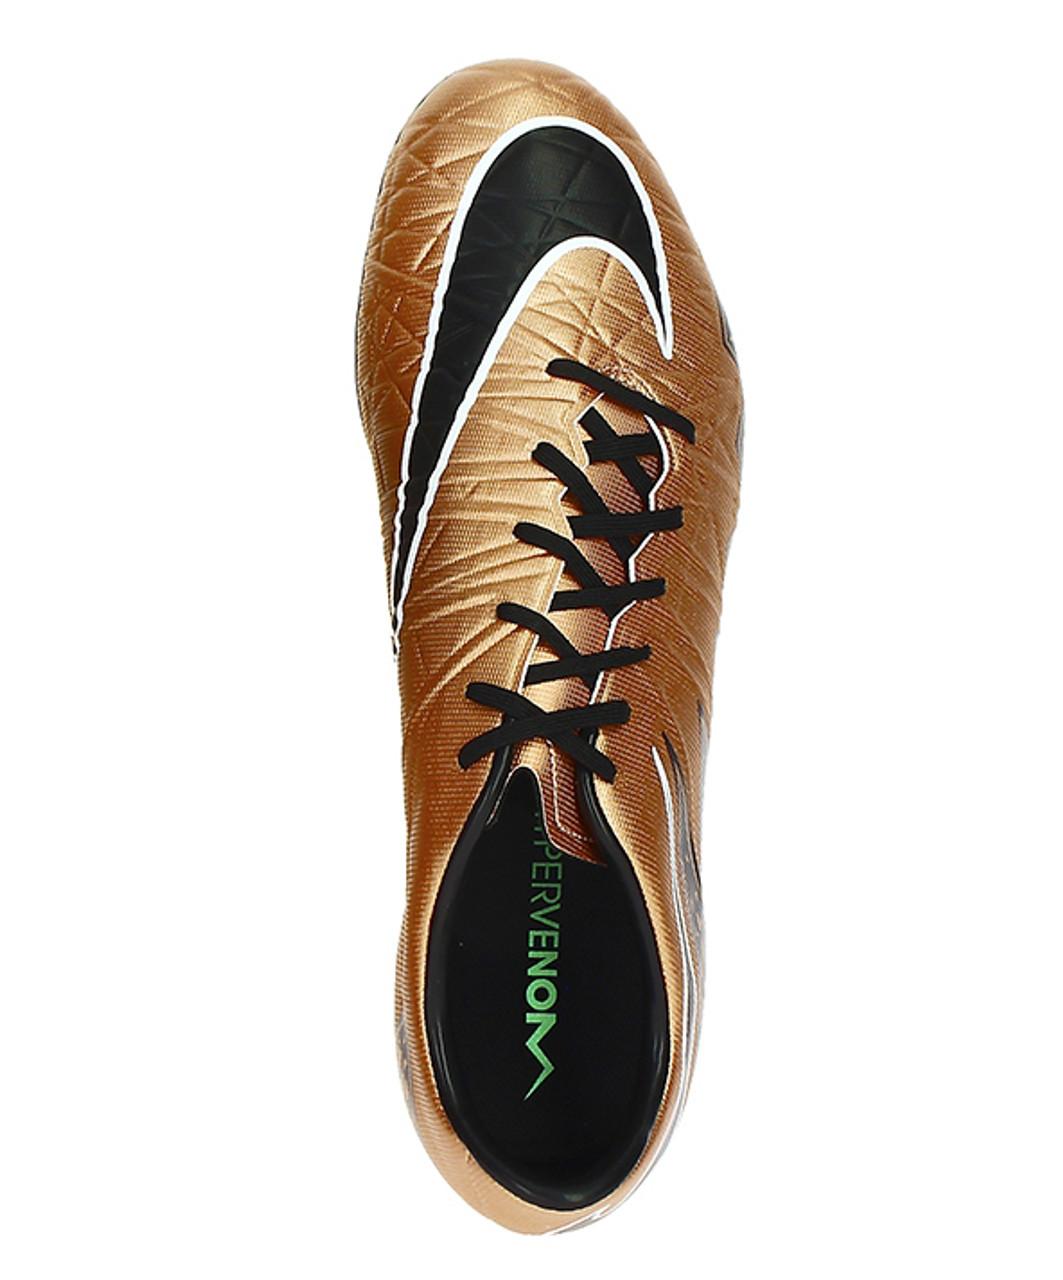 4e279d479b5 Nike Hypervenom Phatal II FG - Metallic Red Brown Black Green Glow ...